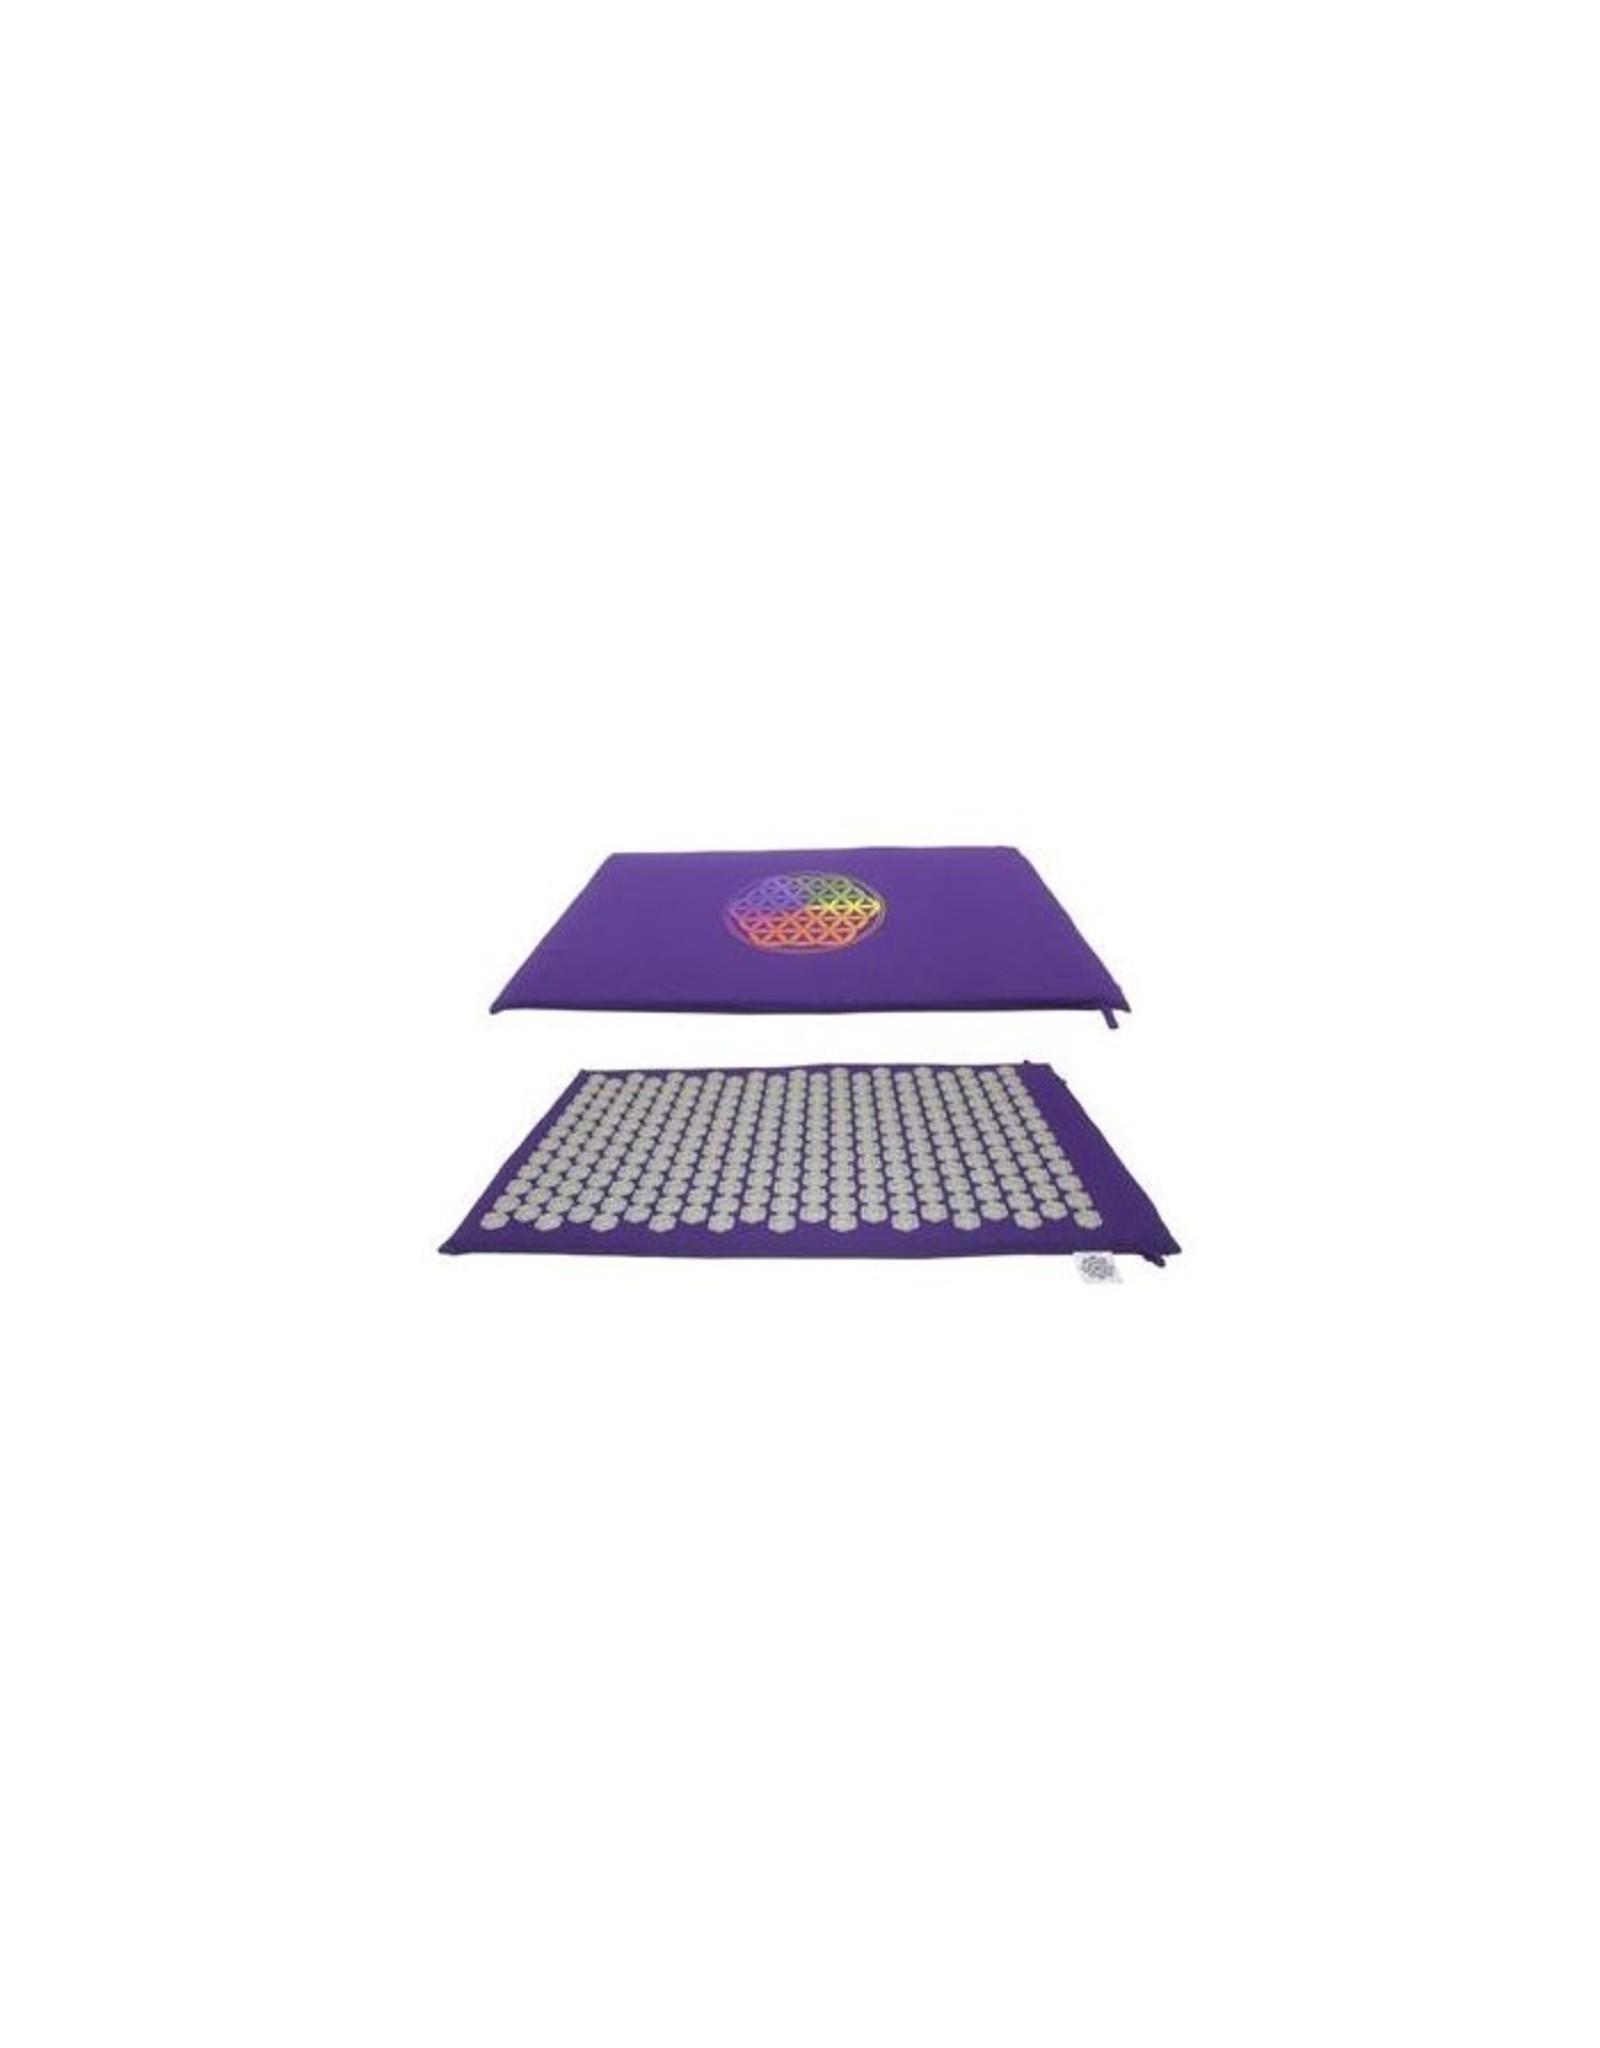 Acupressure flower mat